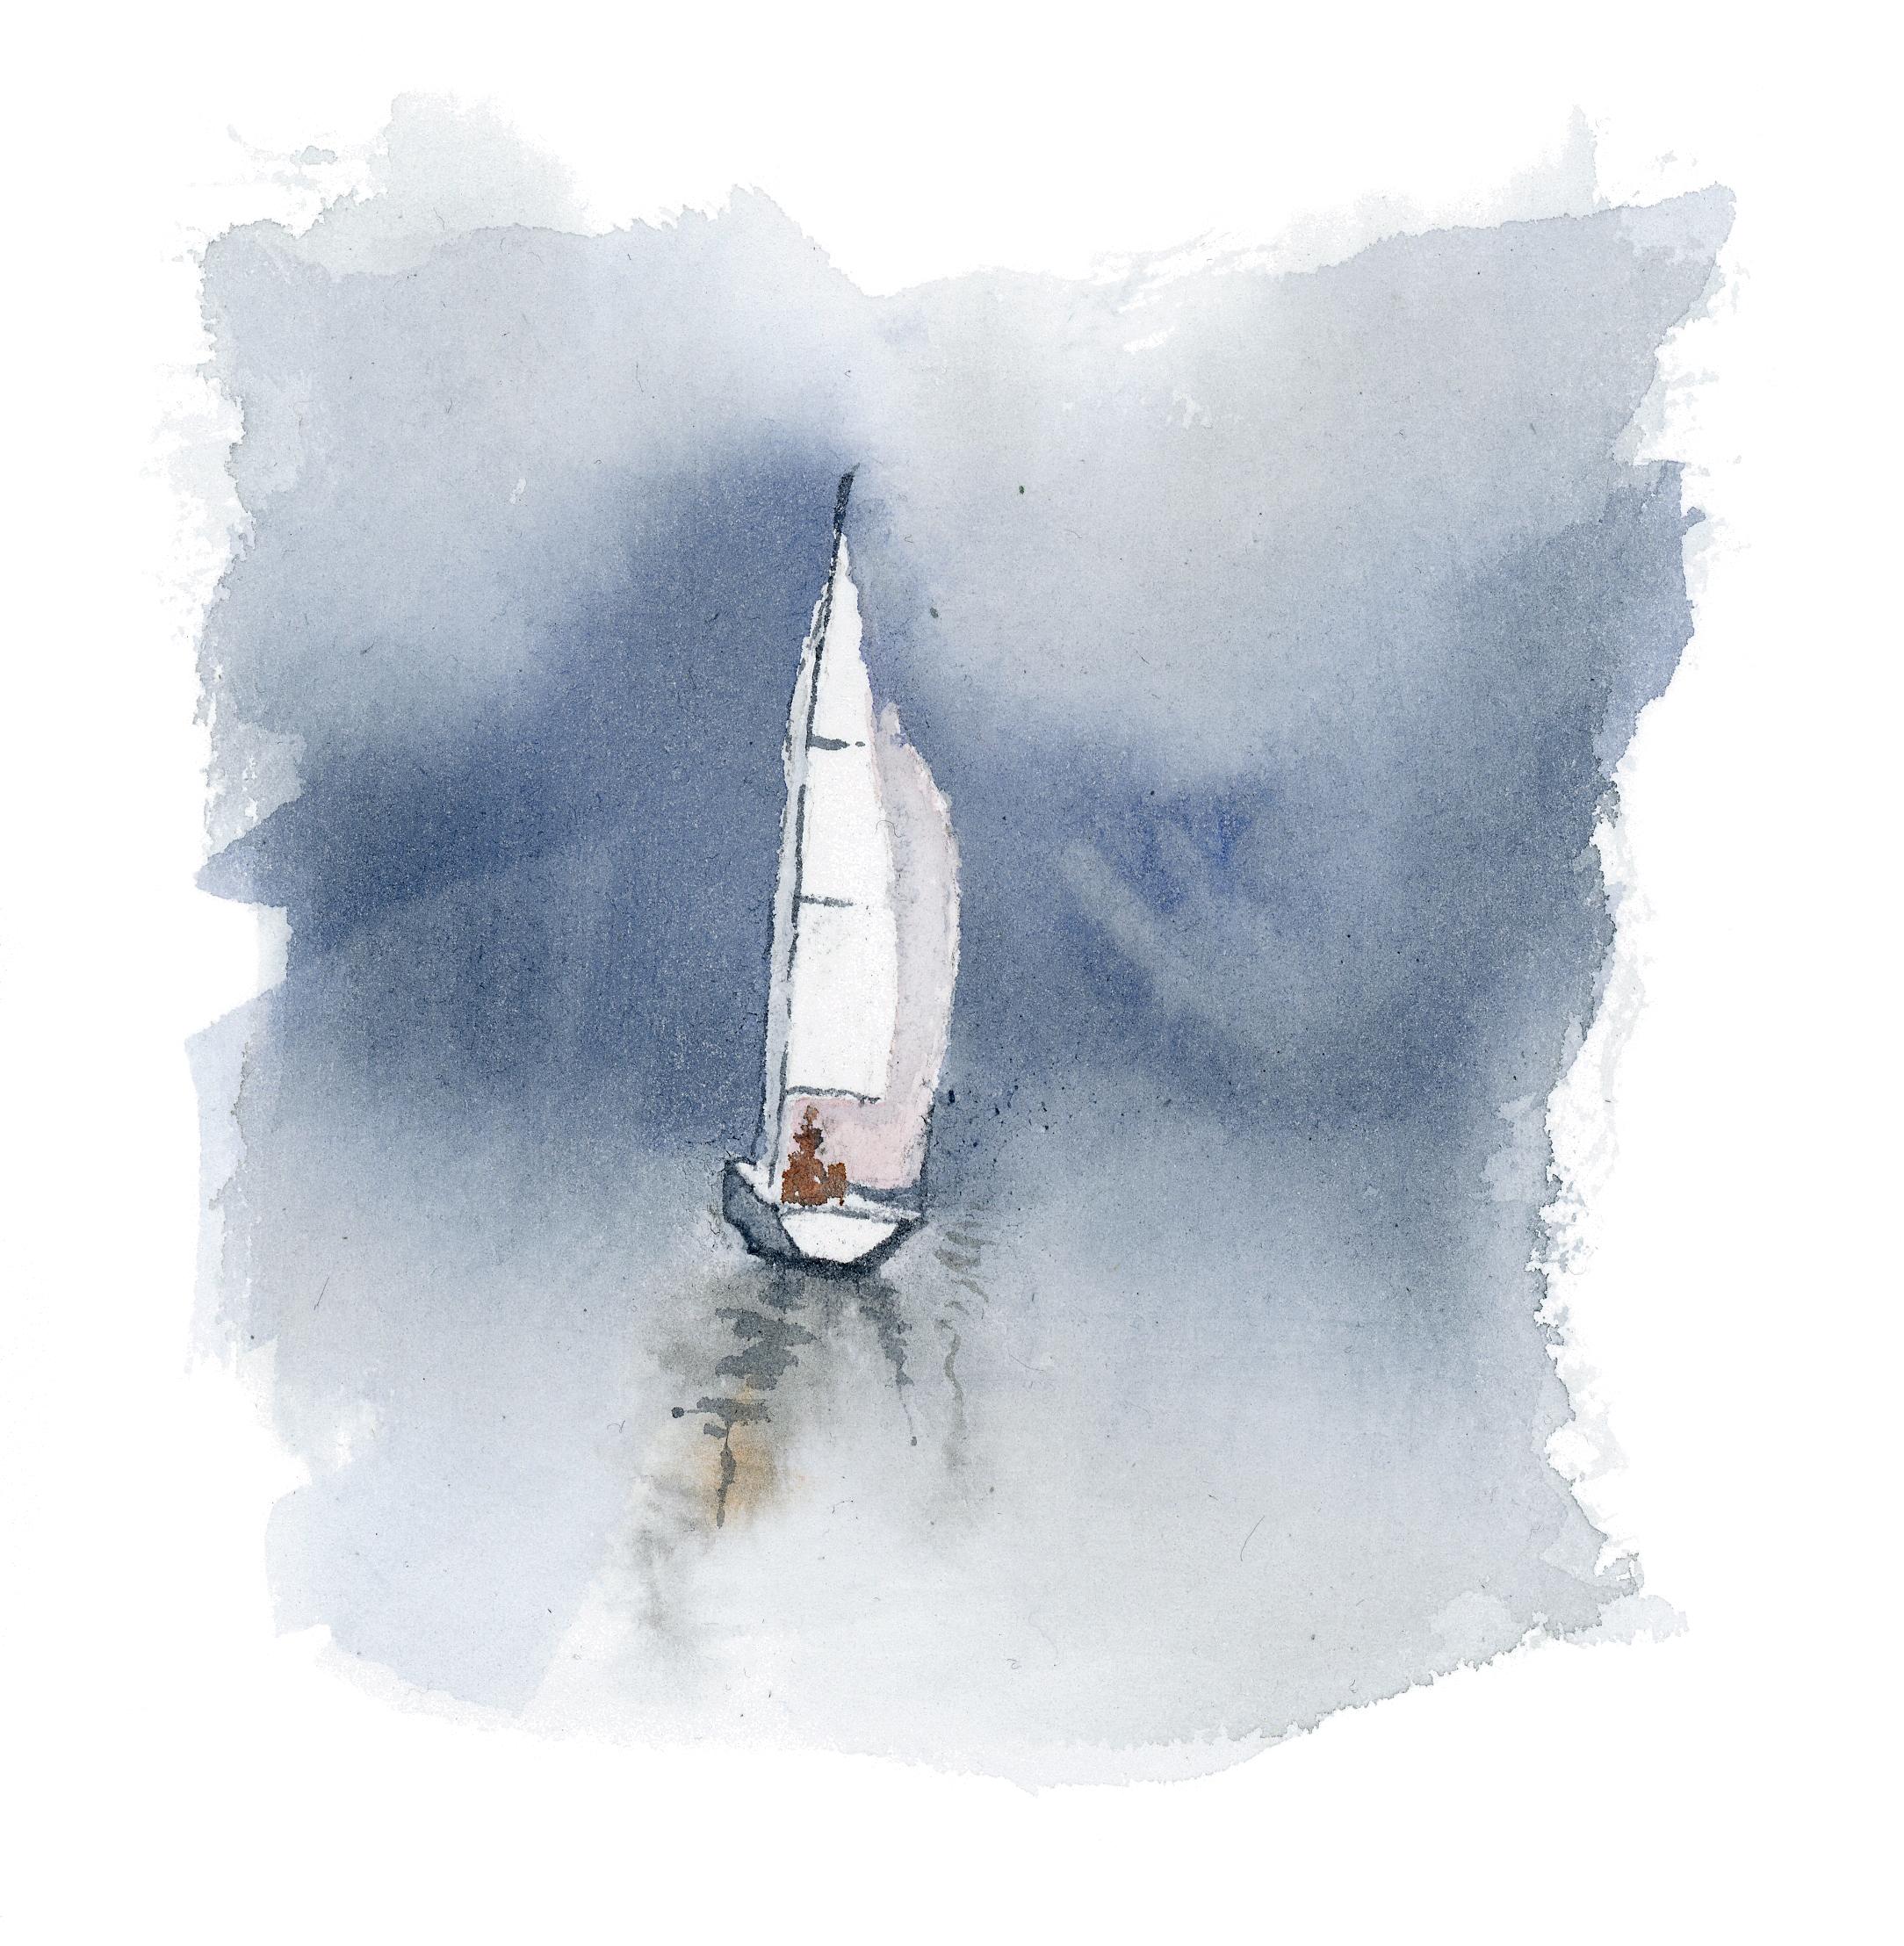 """Mar adentro""  Acuarela Original enmarcada. Tamaño Lámina: 13 x 13 cms. Valor:$ 65.000  DISPONIBLE"